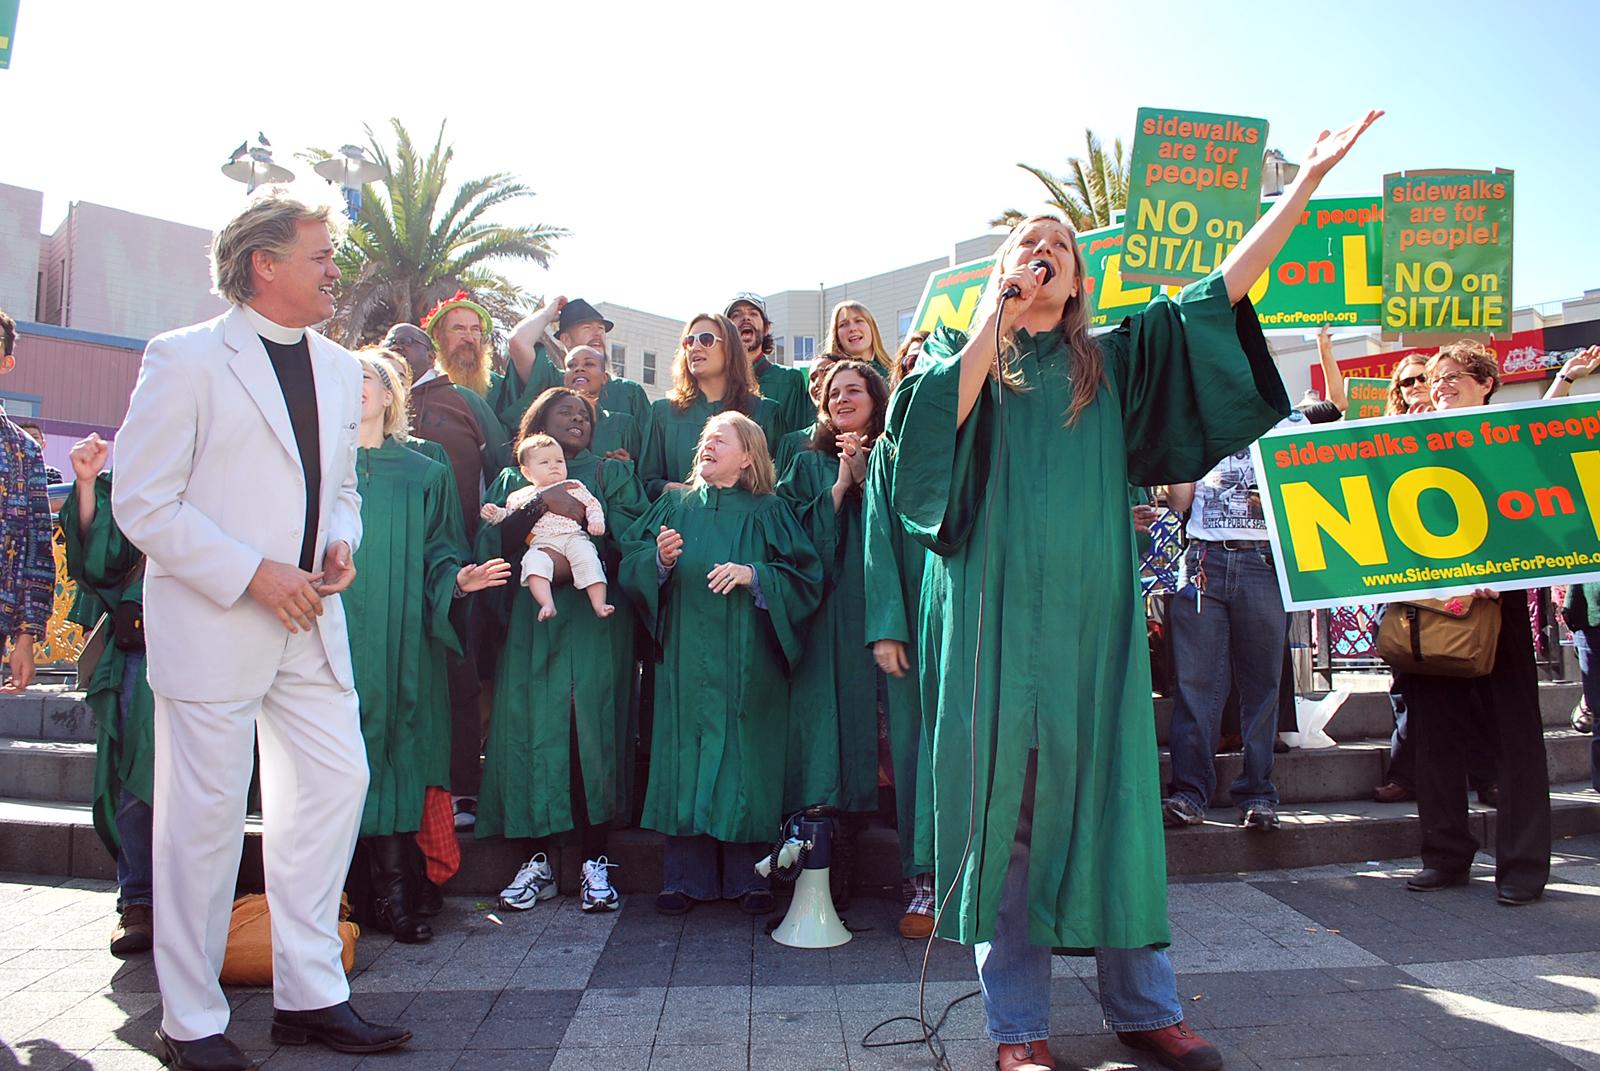 Gospel Choir Damns Sit/Lie Measure